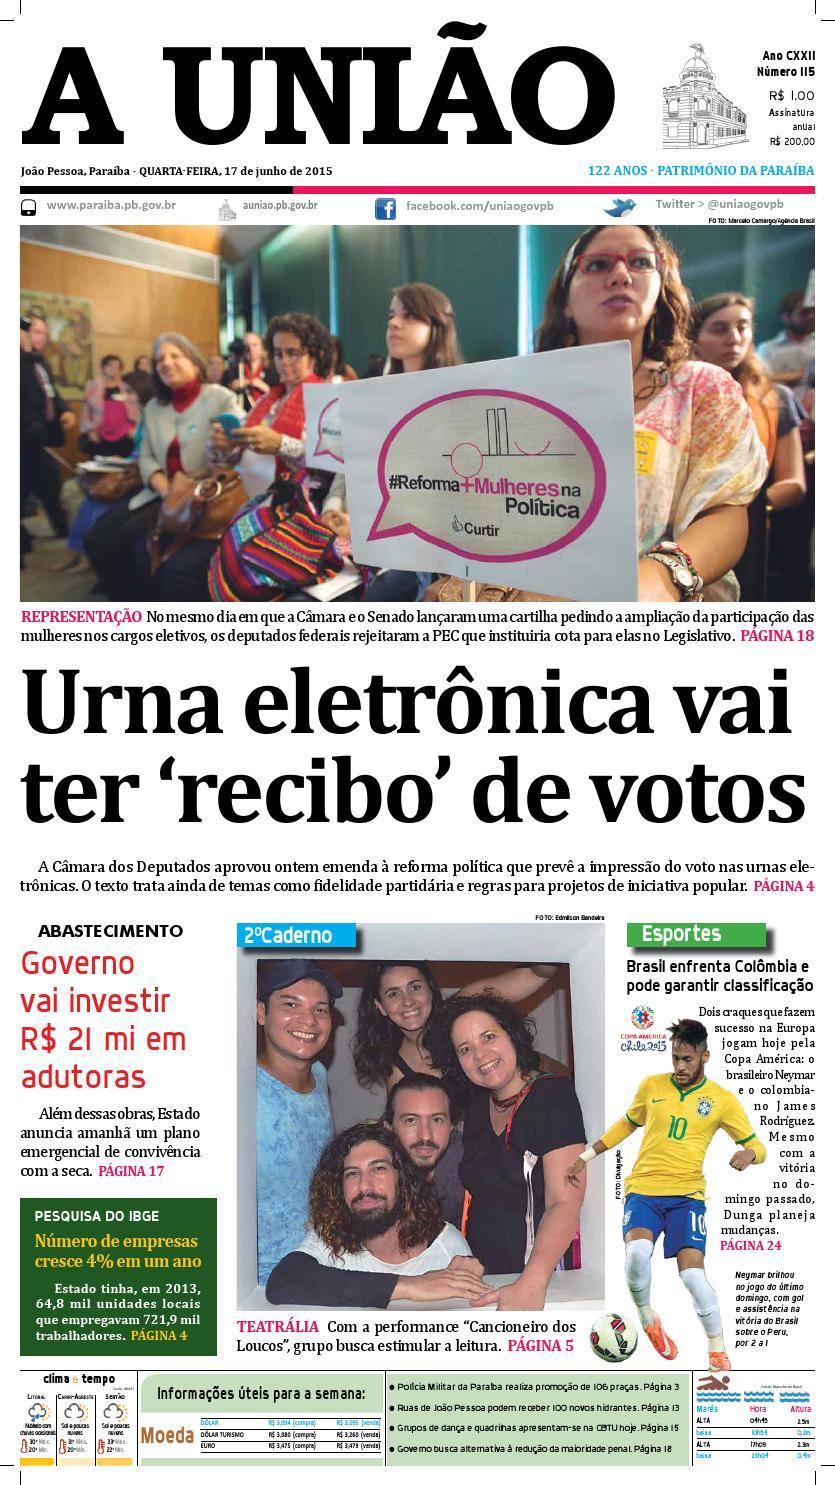 ff3949fd10 Jornal A União - 17 06 2105 by Jornal A União - issuu